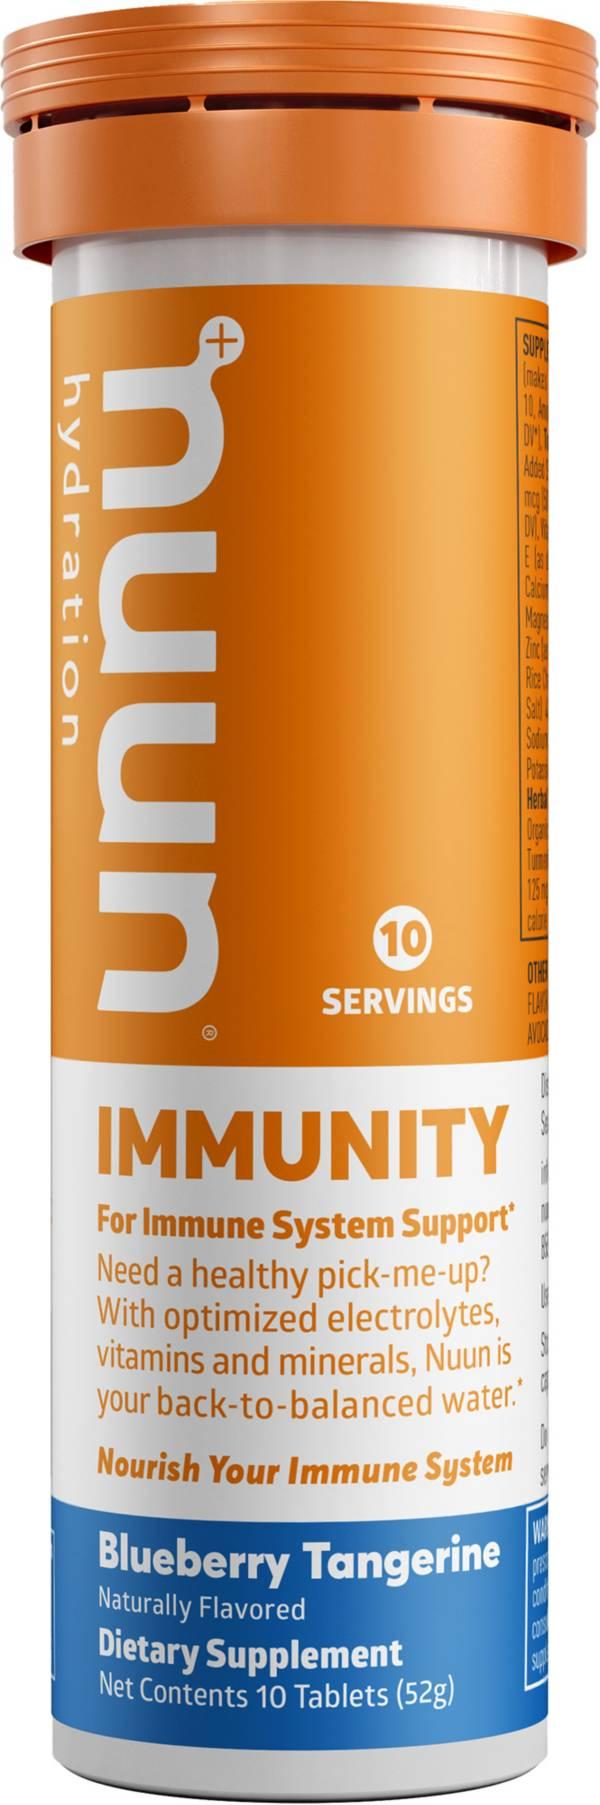 Nuun Immunity Blueberry Tangerine 10 Tablets product image